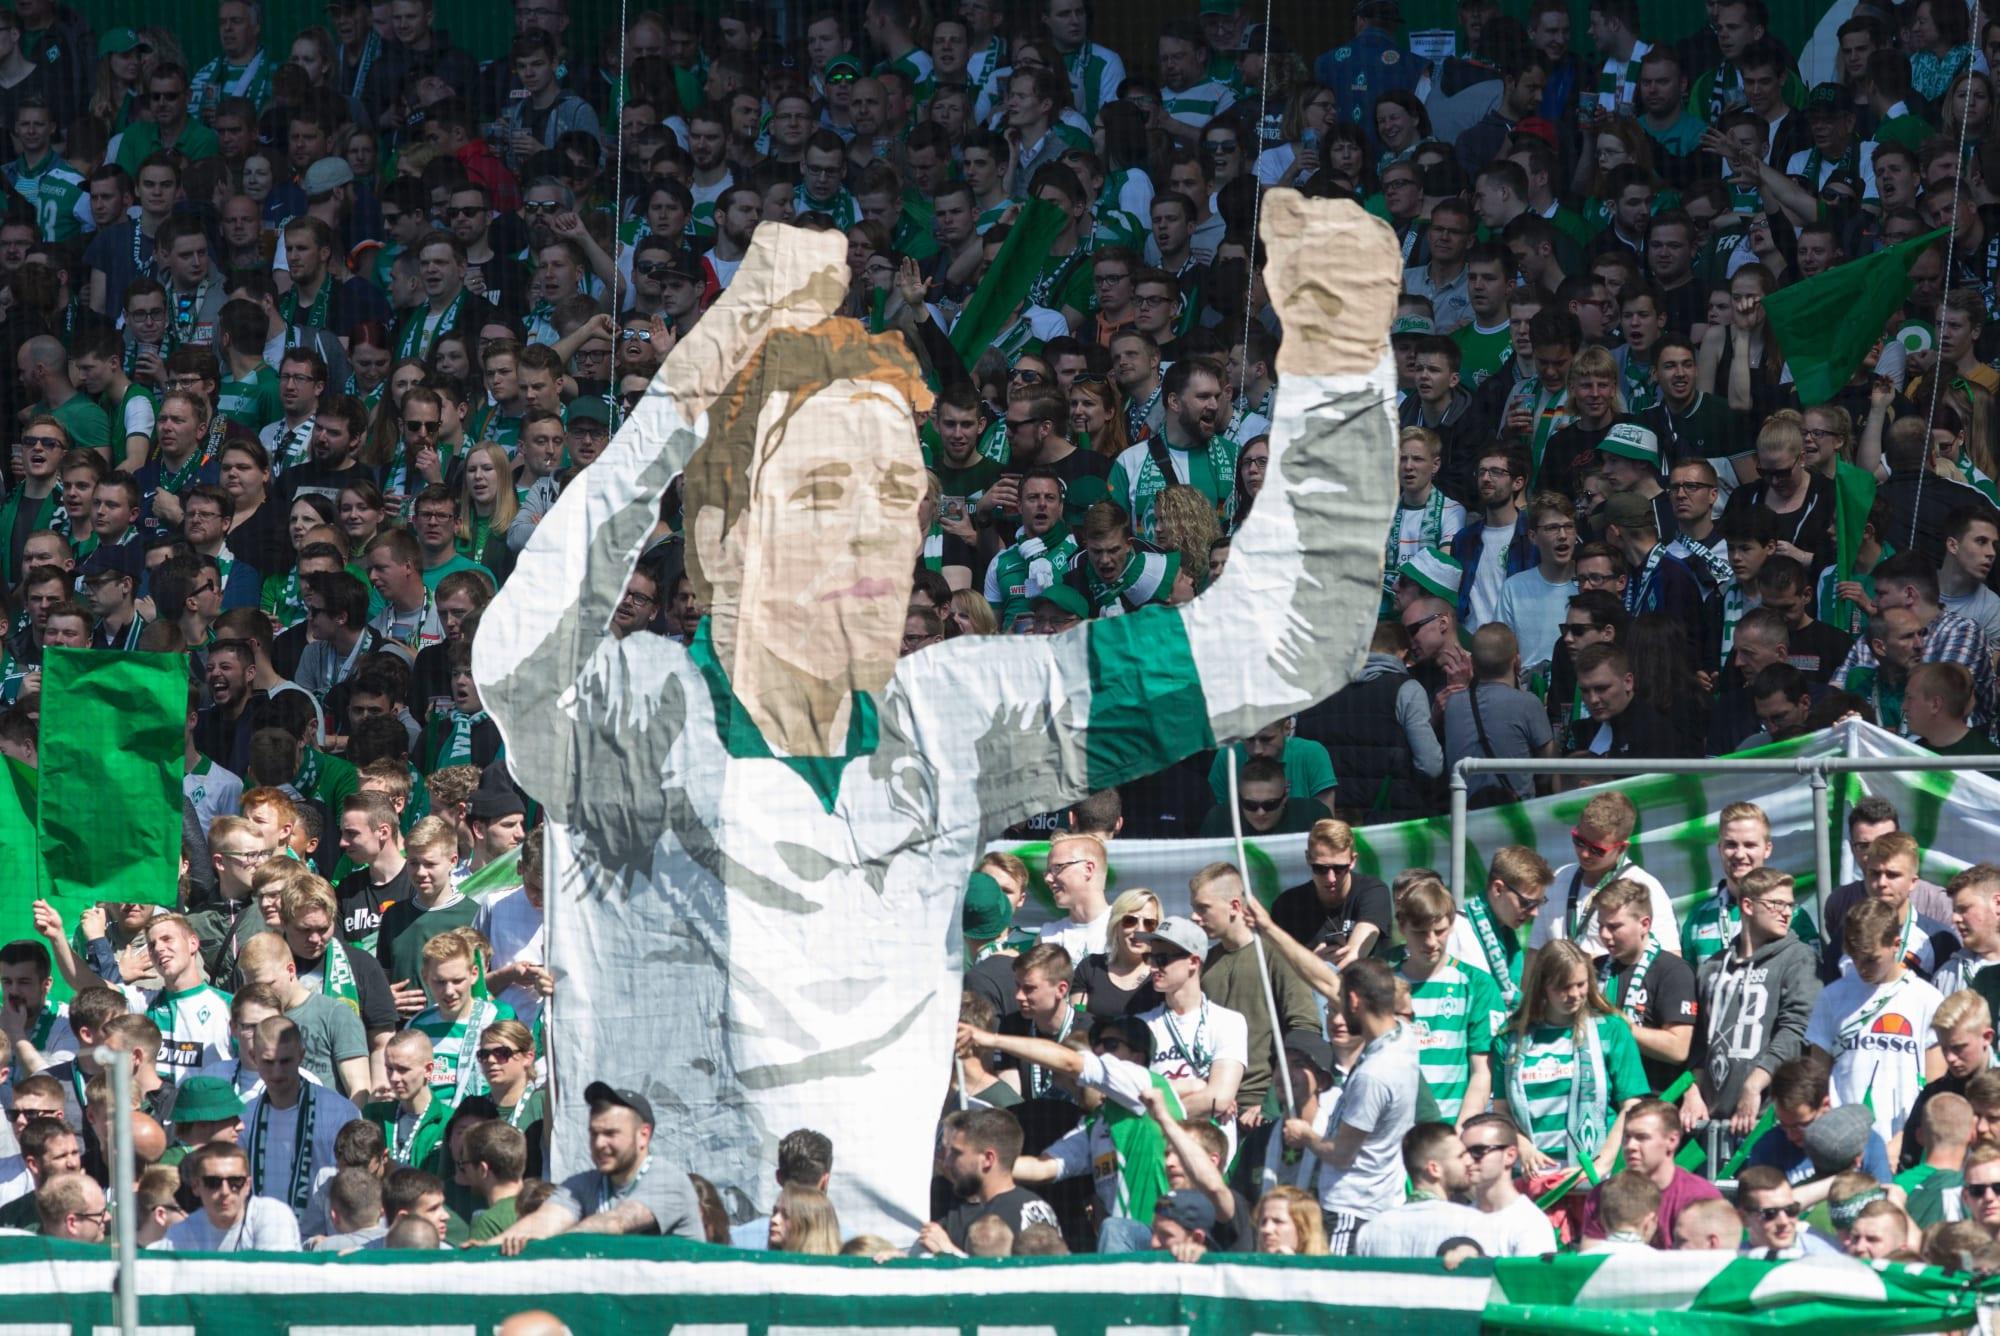 Dortmund Vs Werder Bremen: It All Comes Down To This